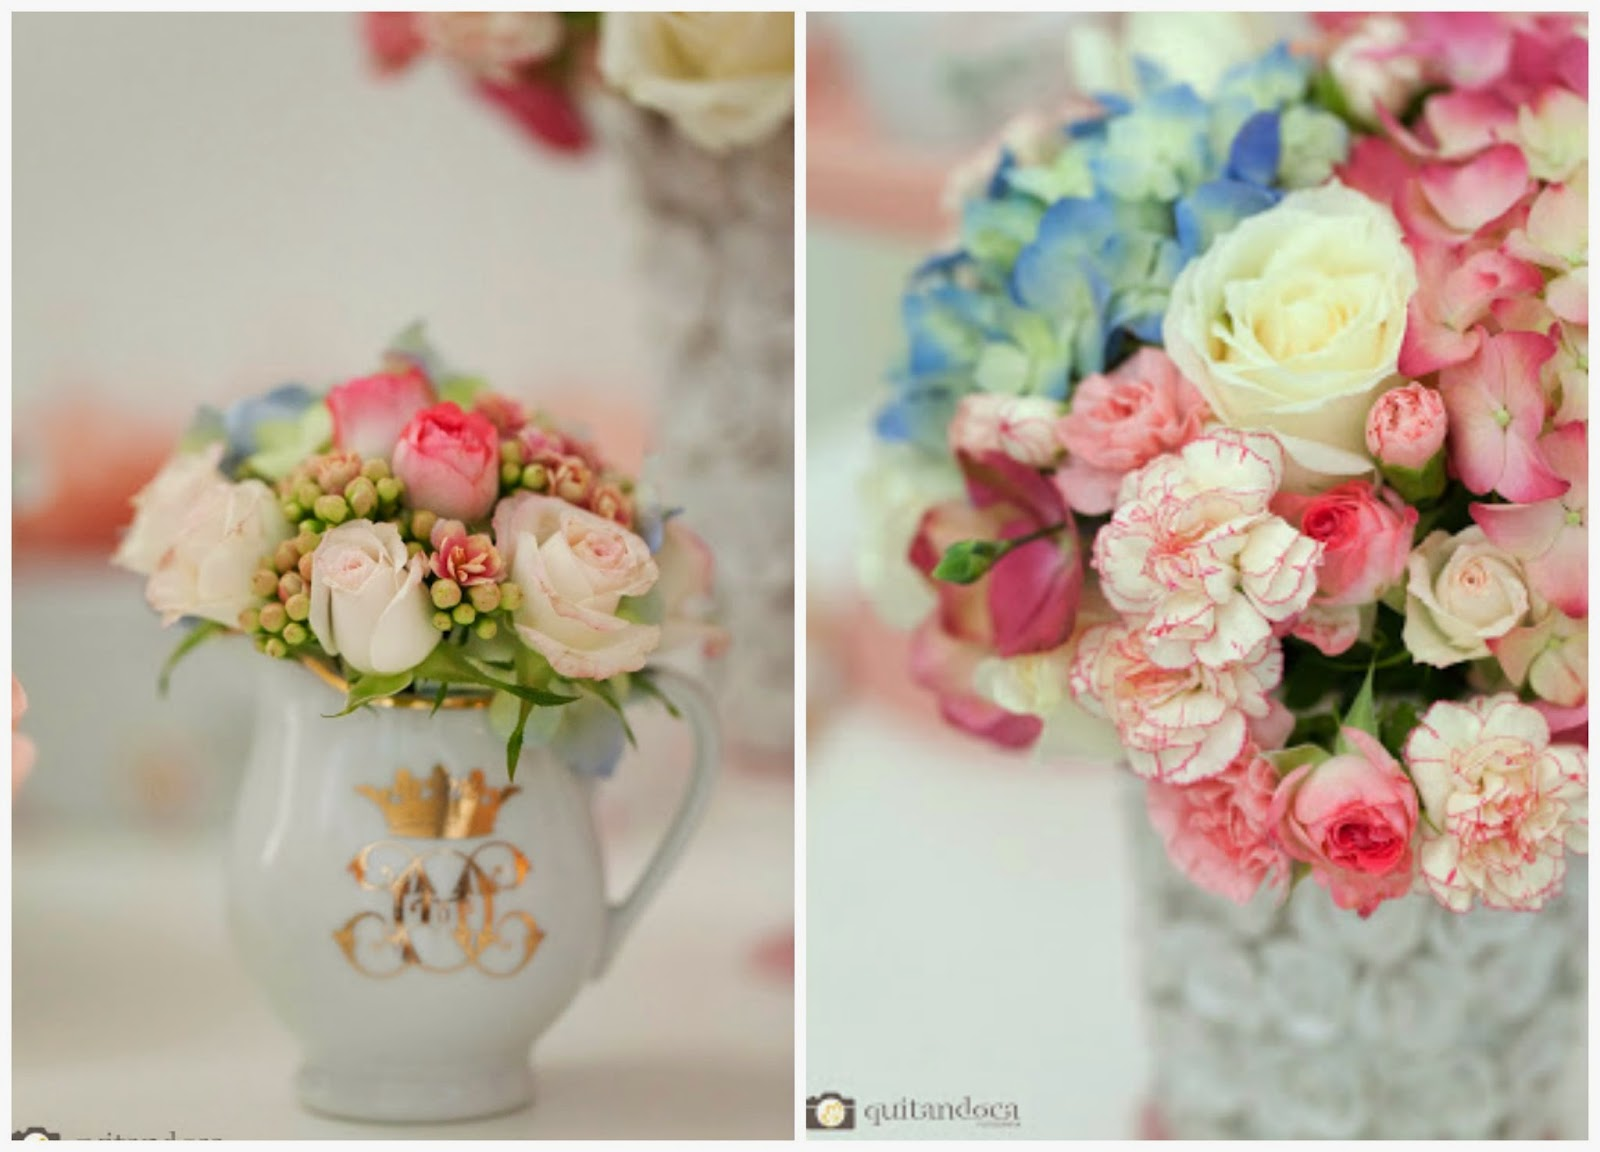 inspiracao-shabby-chic-romantica-delicada-candy-colors-flores-1